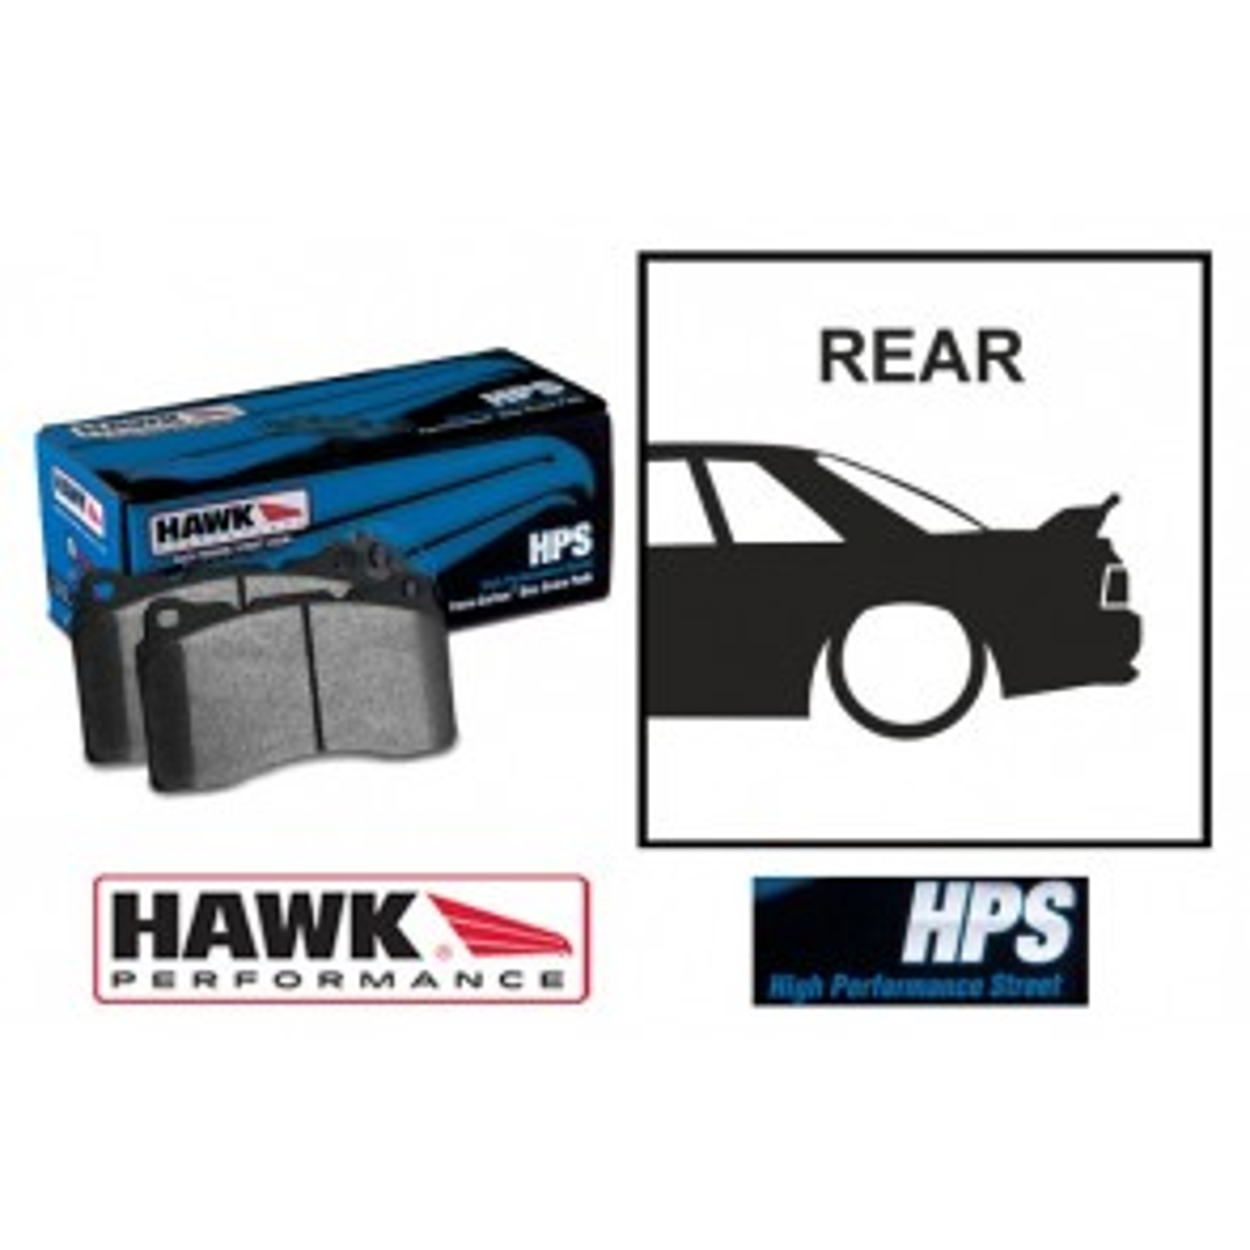 Hawk Rear Brake Pads - Subaru Impreza WRX STI 2004 - 2015